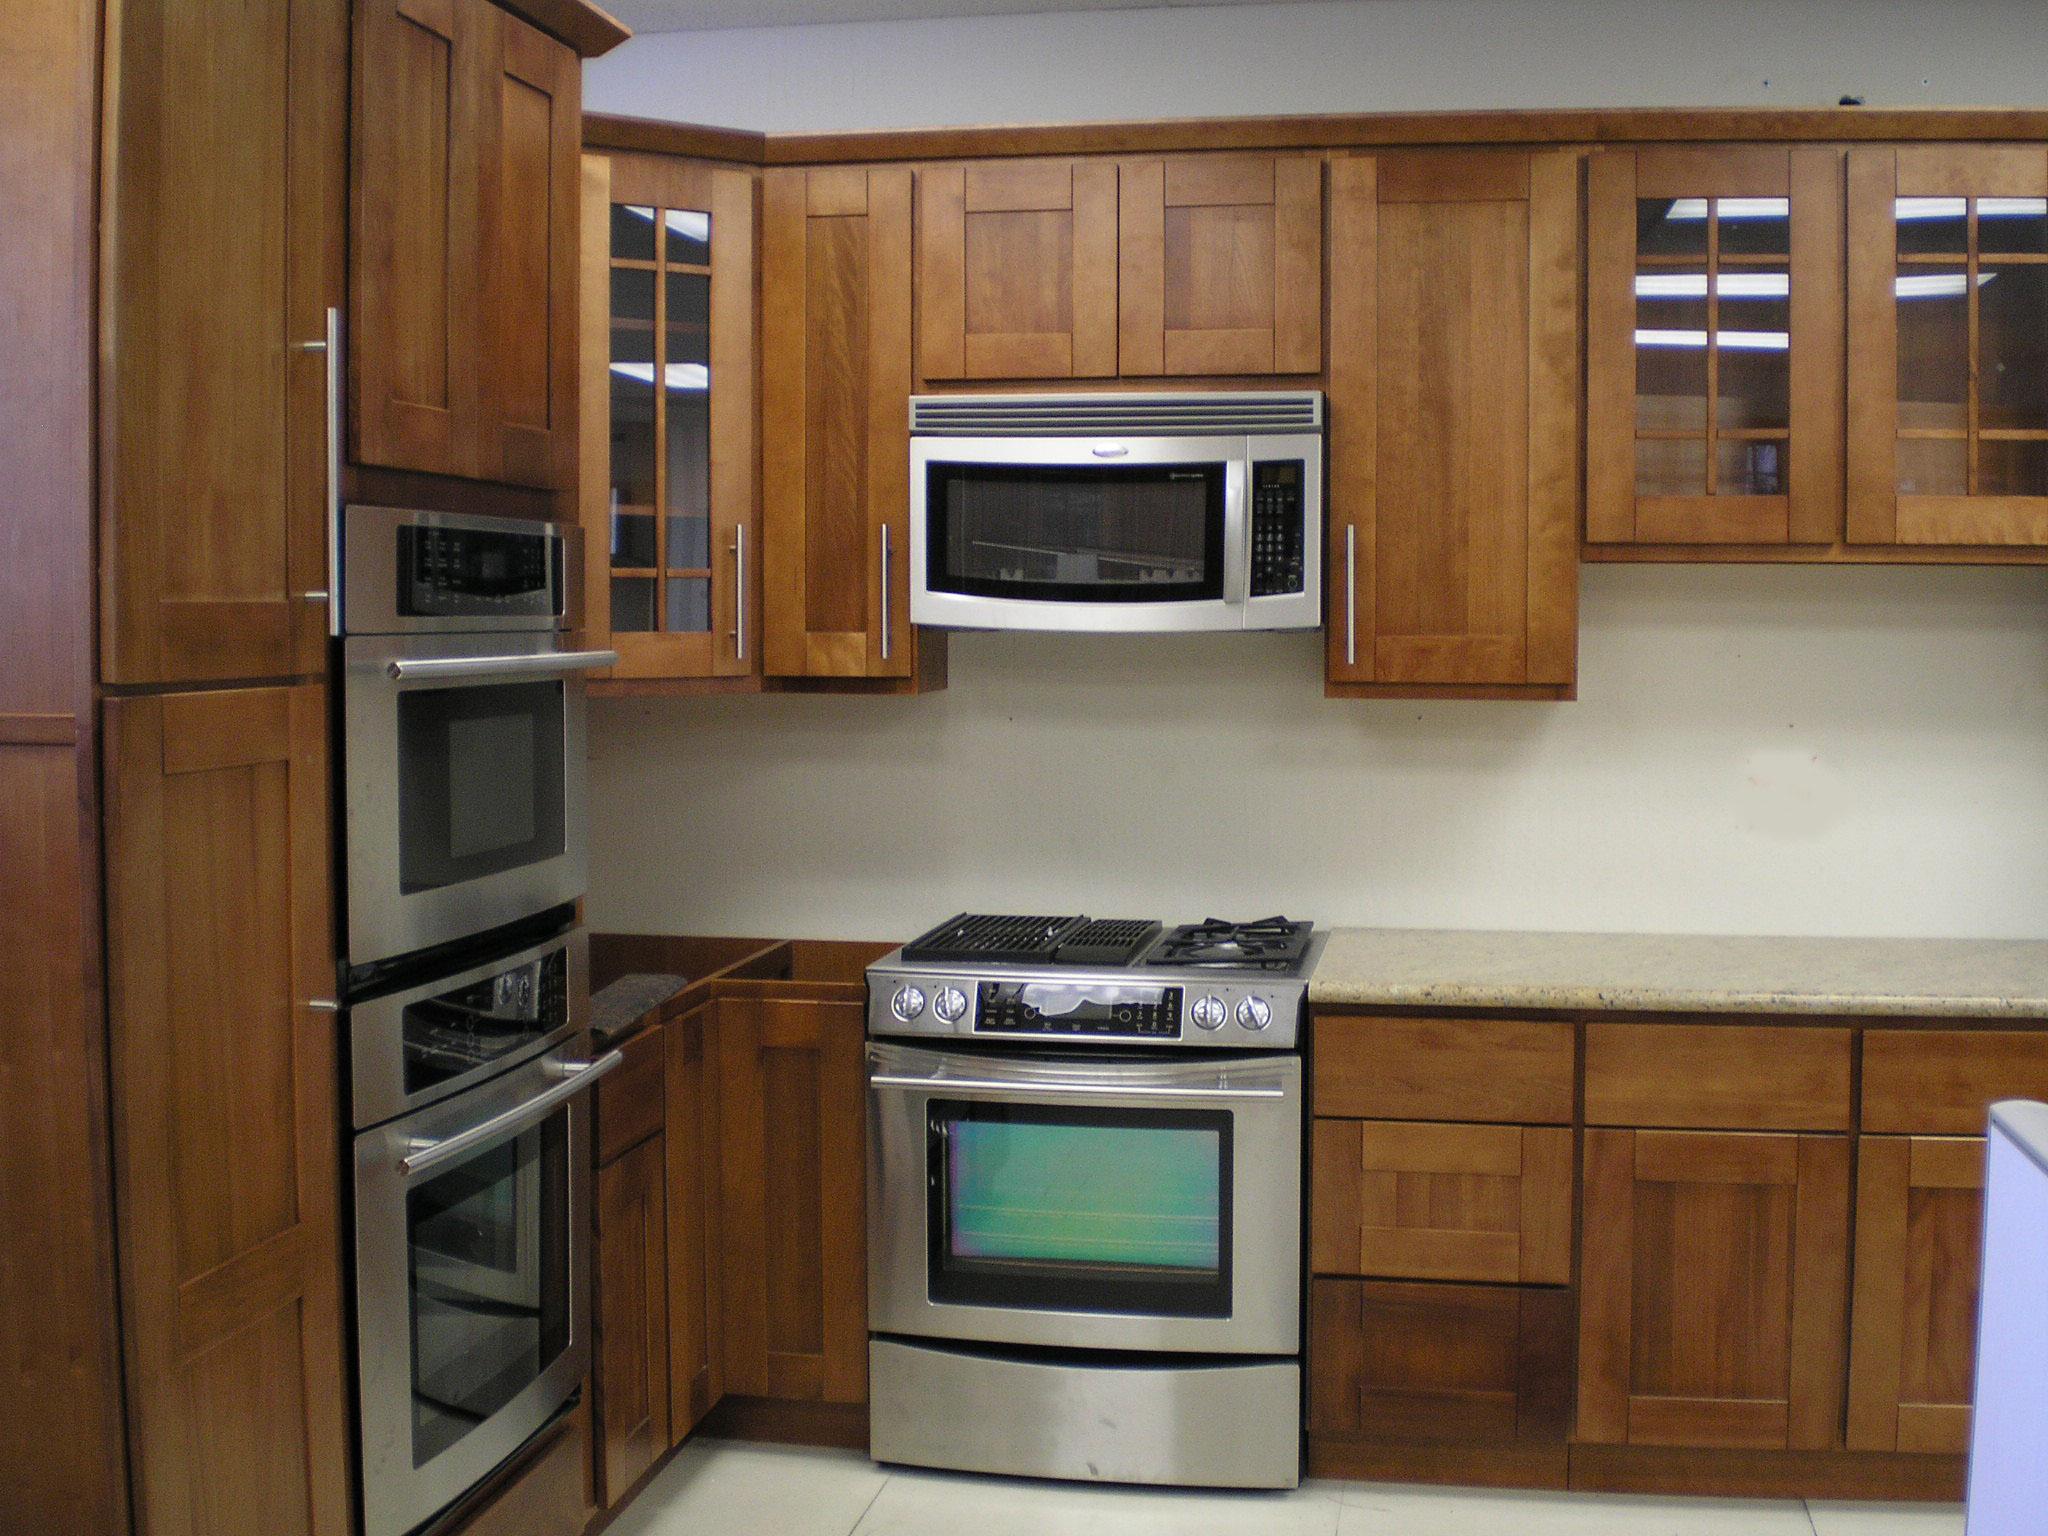 cherry kitchen cabinets wholesale kitchen cabinets Raised Panel Shaker Style Toffee Finish